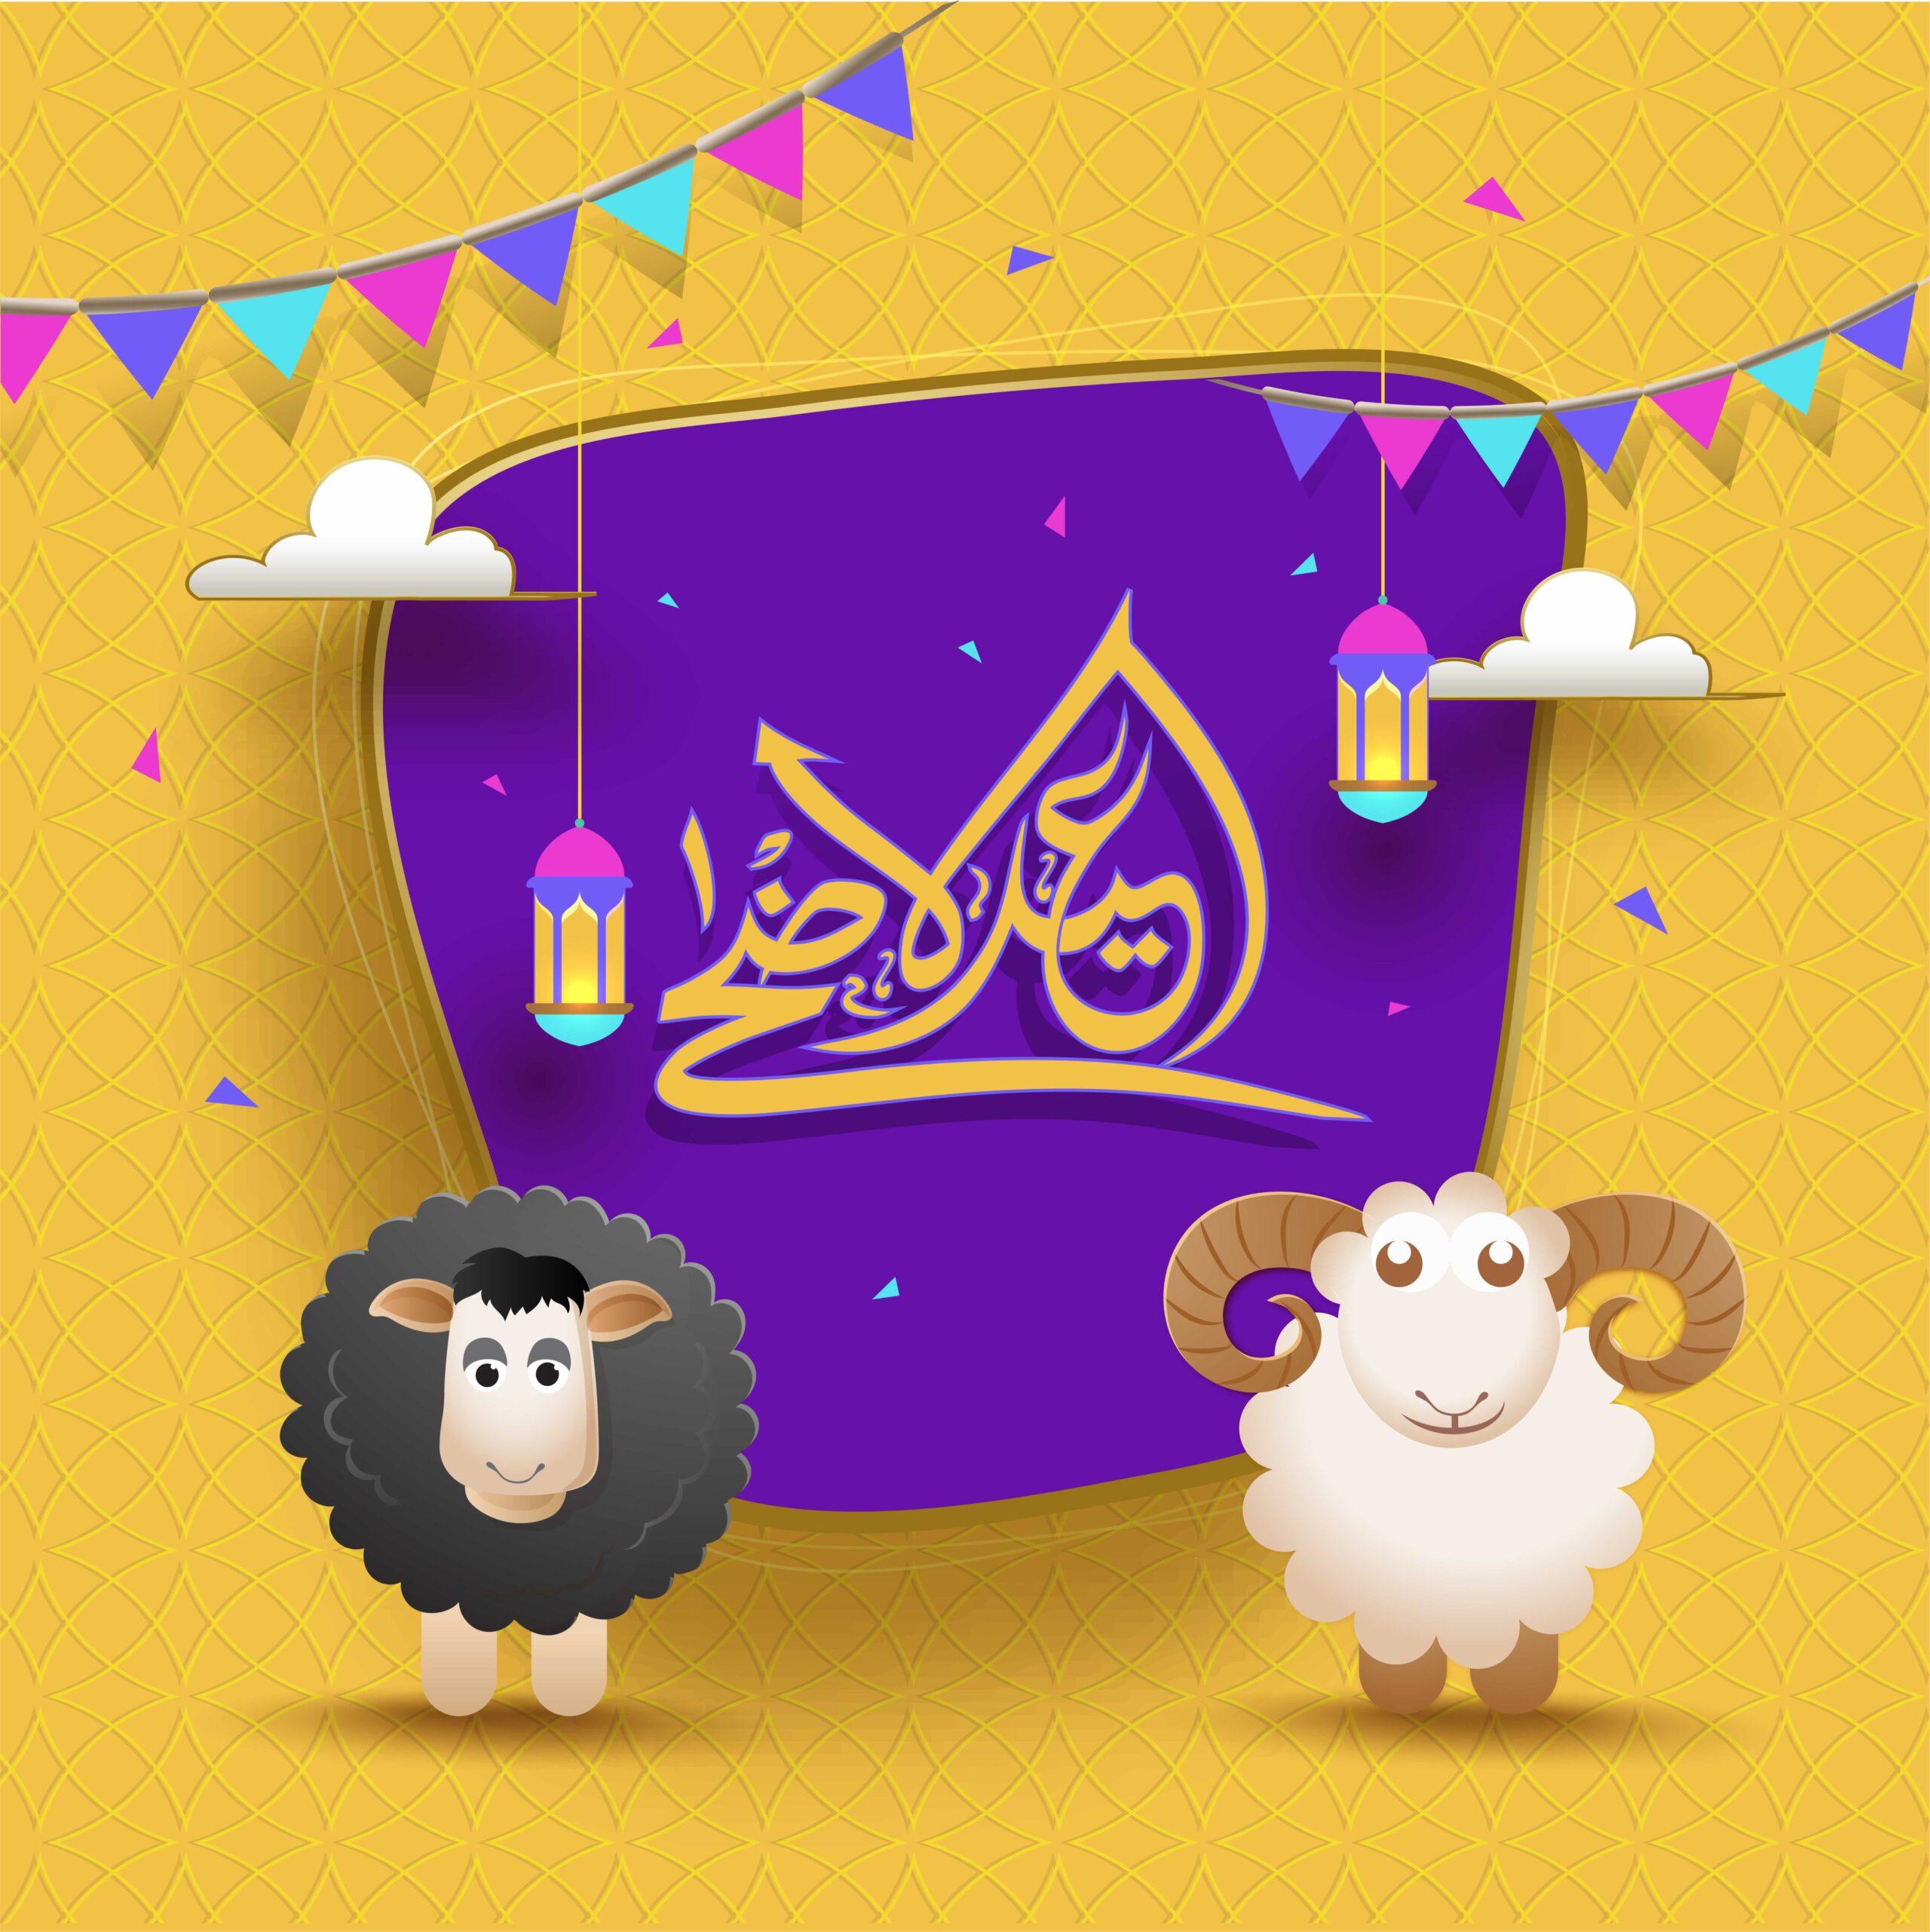 Paper cutout style Eid-Al-Adha mubarek greeting card